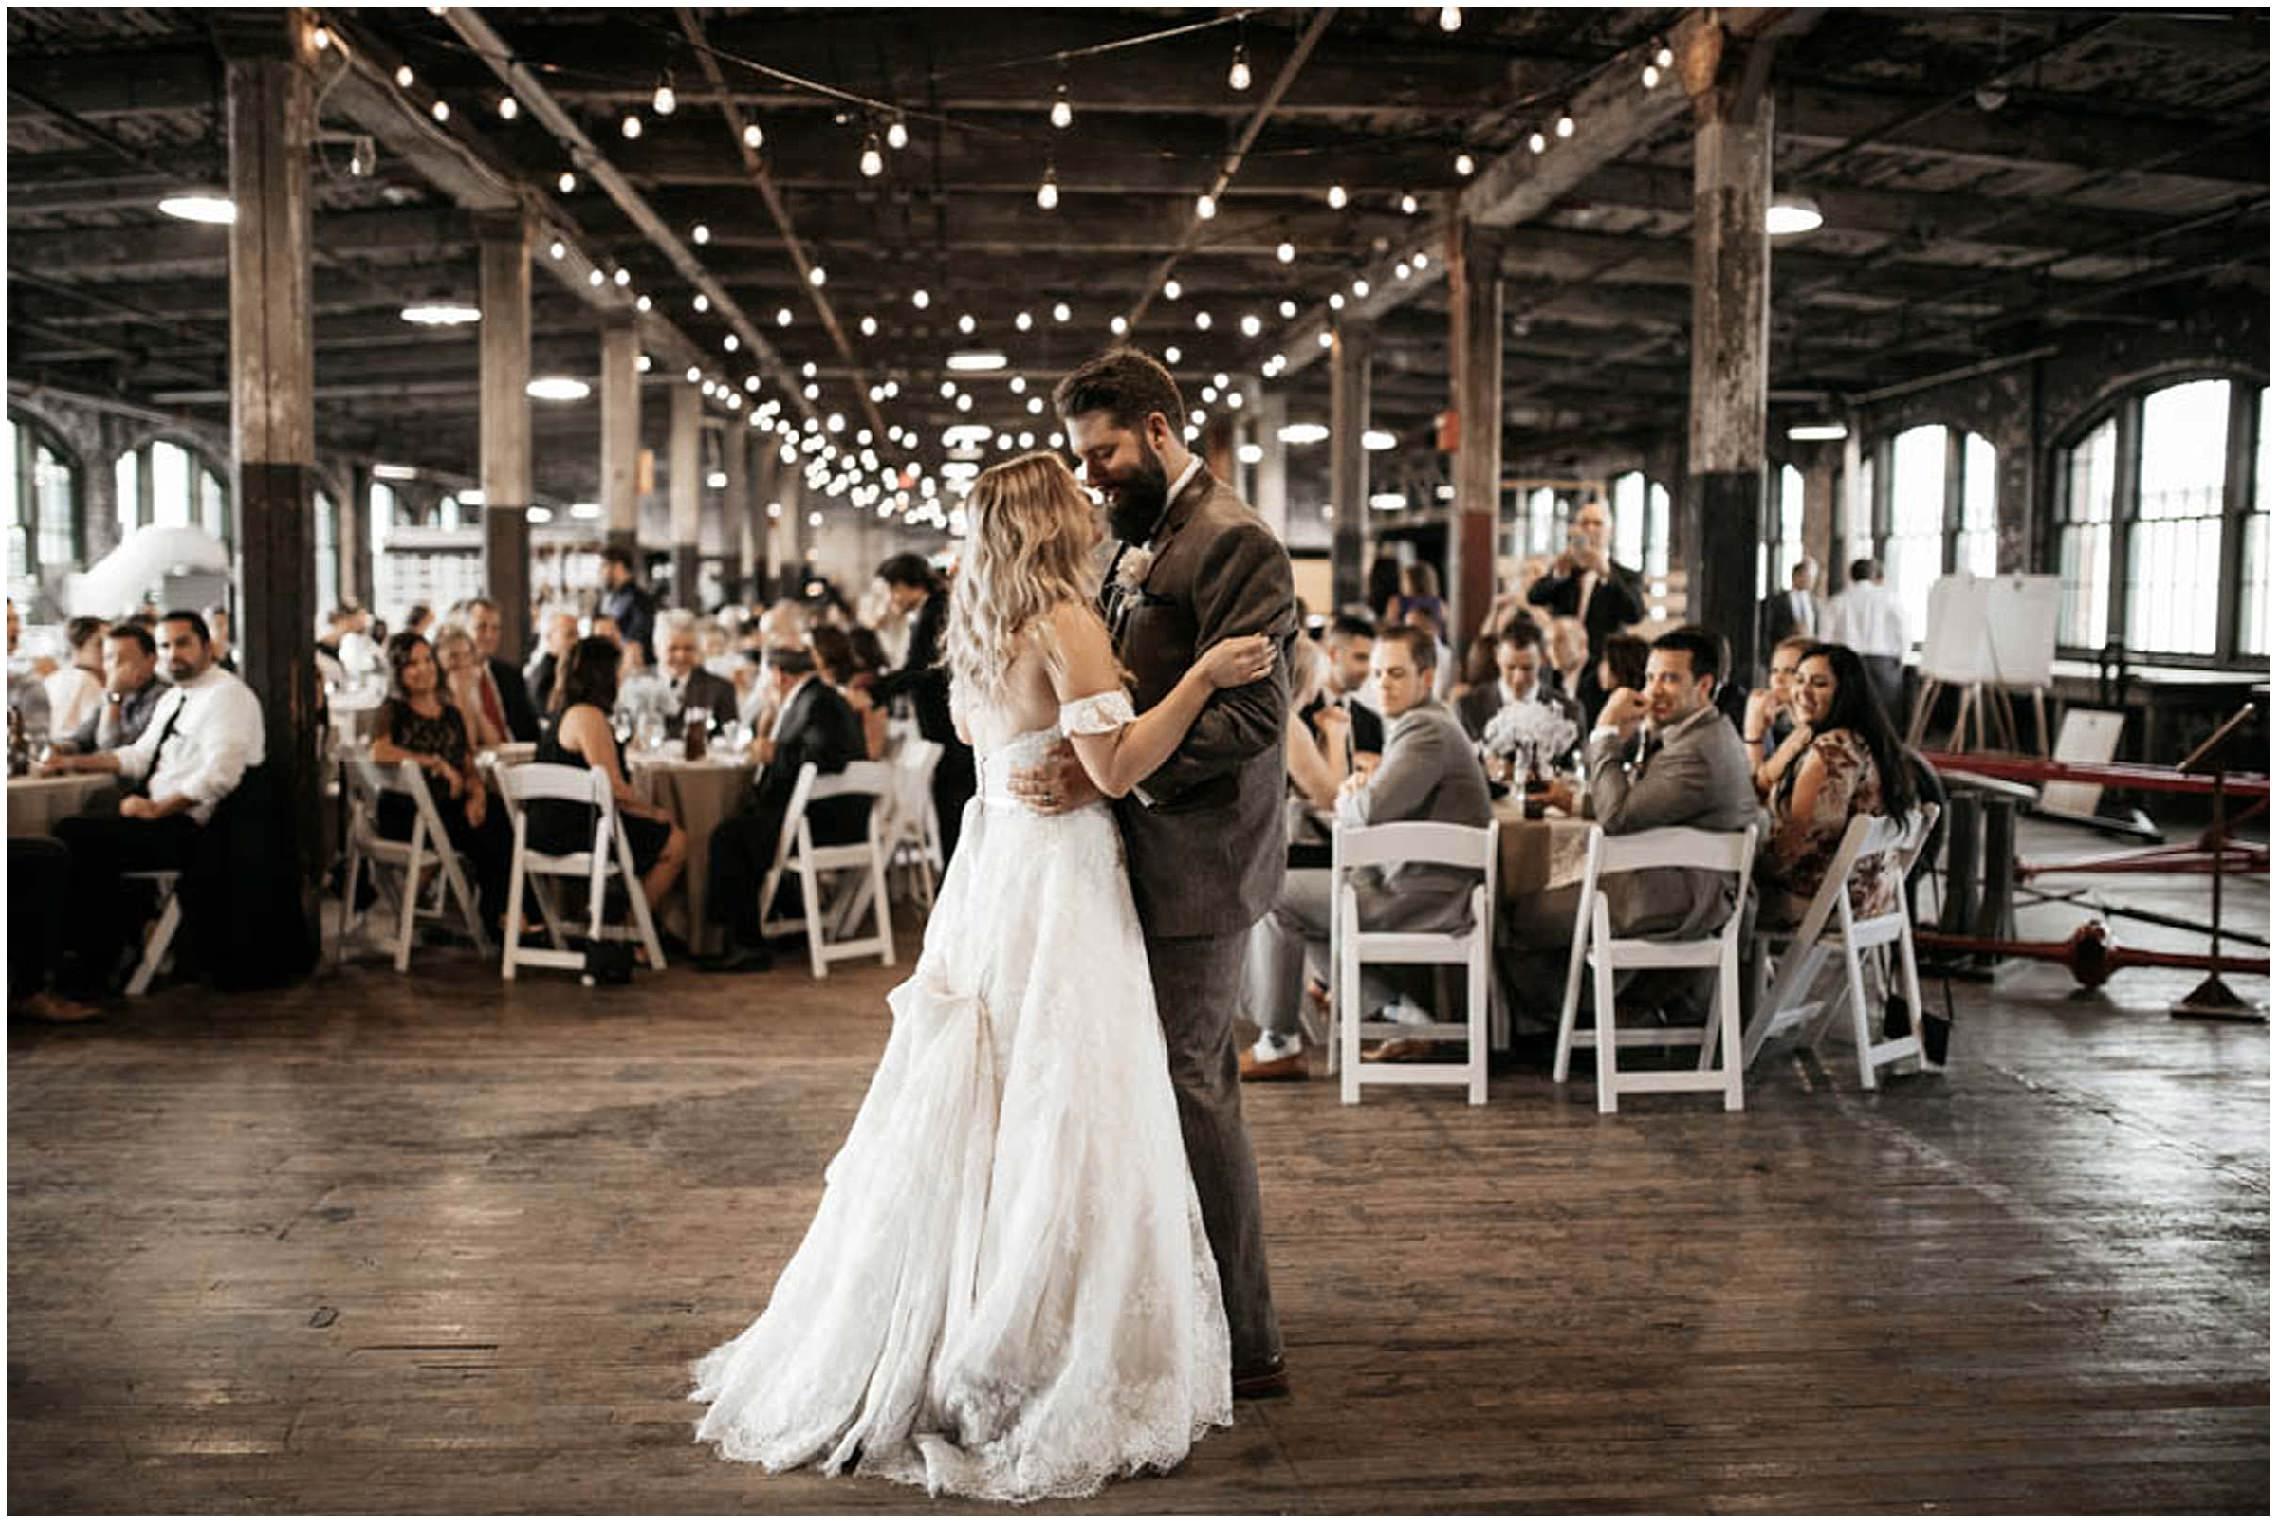 brick_and_mortar_colorado_wedding_photographer_0263.jpg